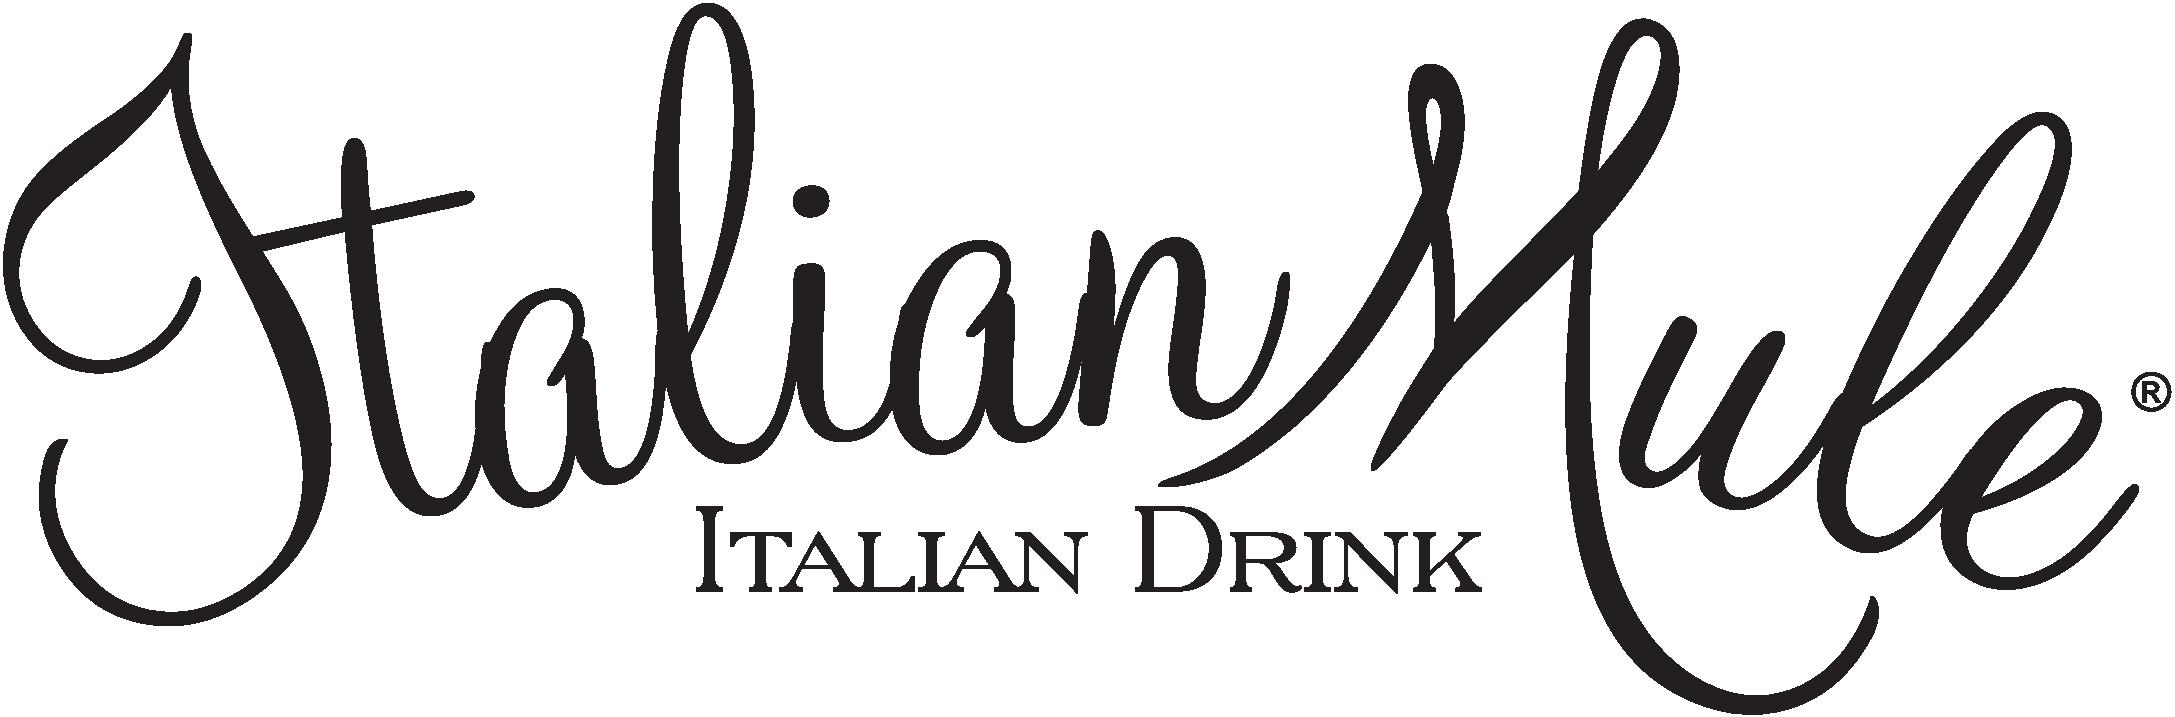 Italian Mule Logo.png